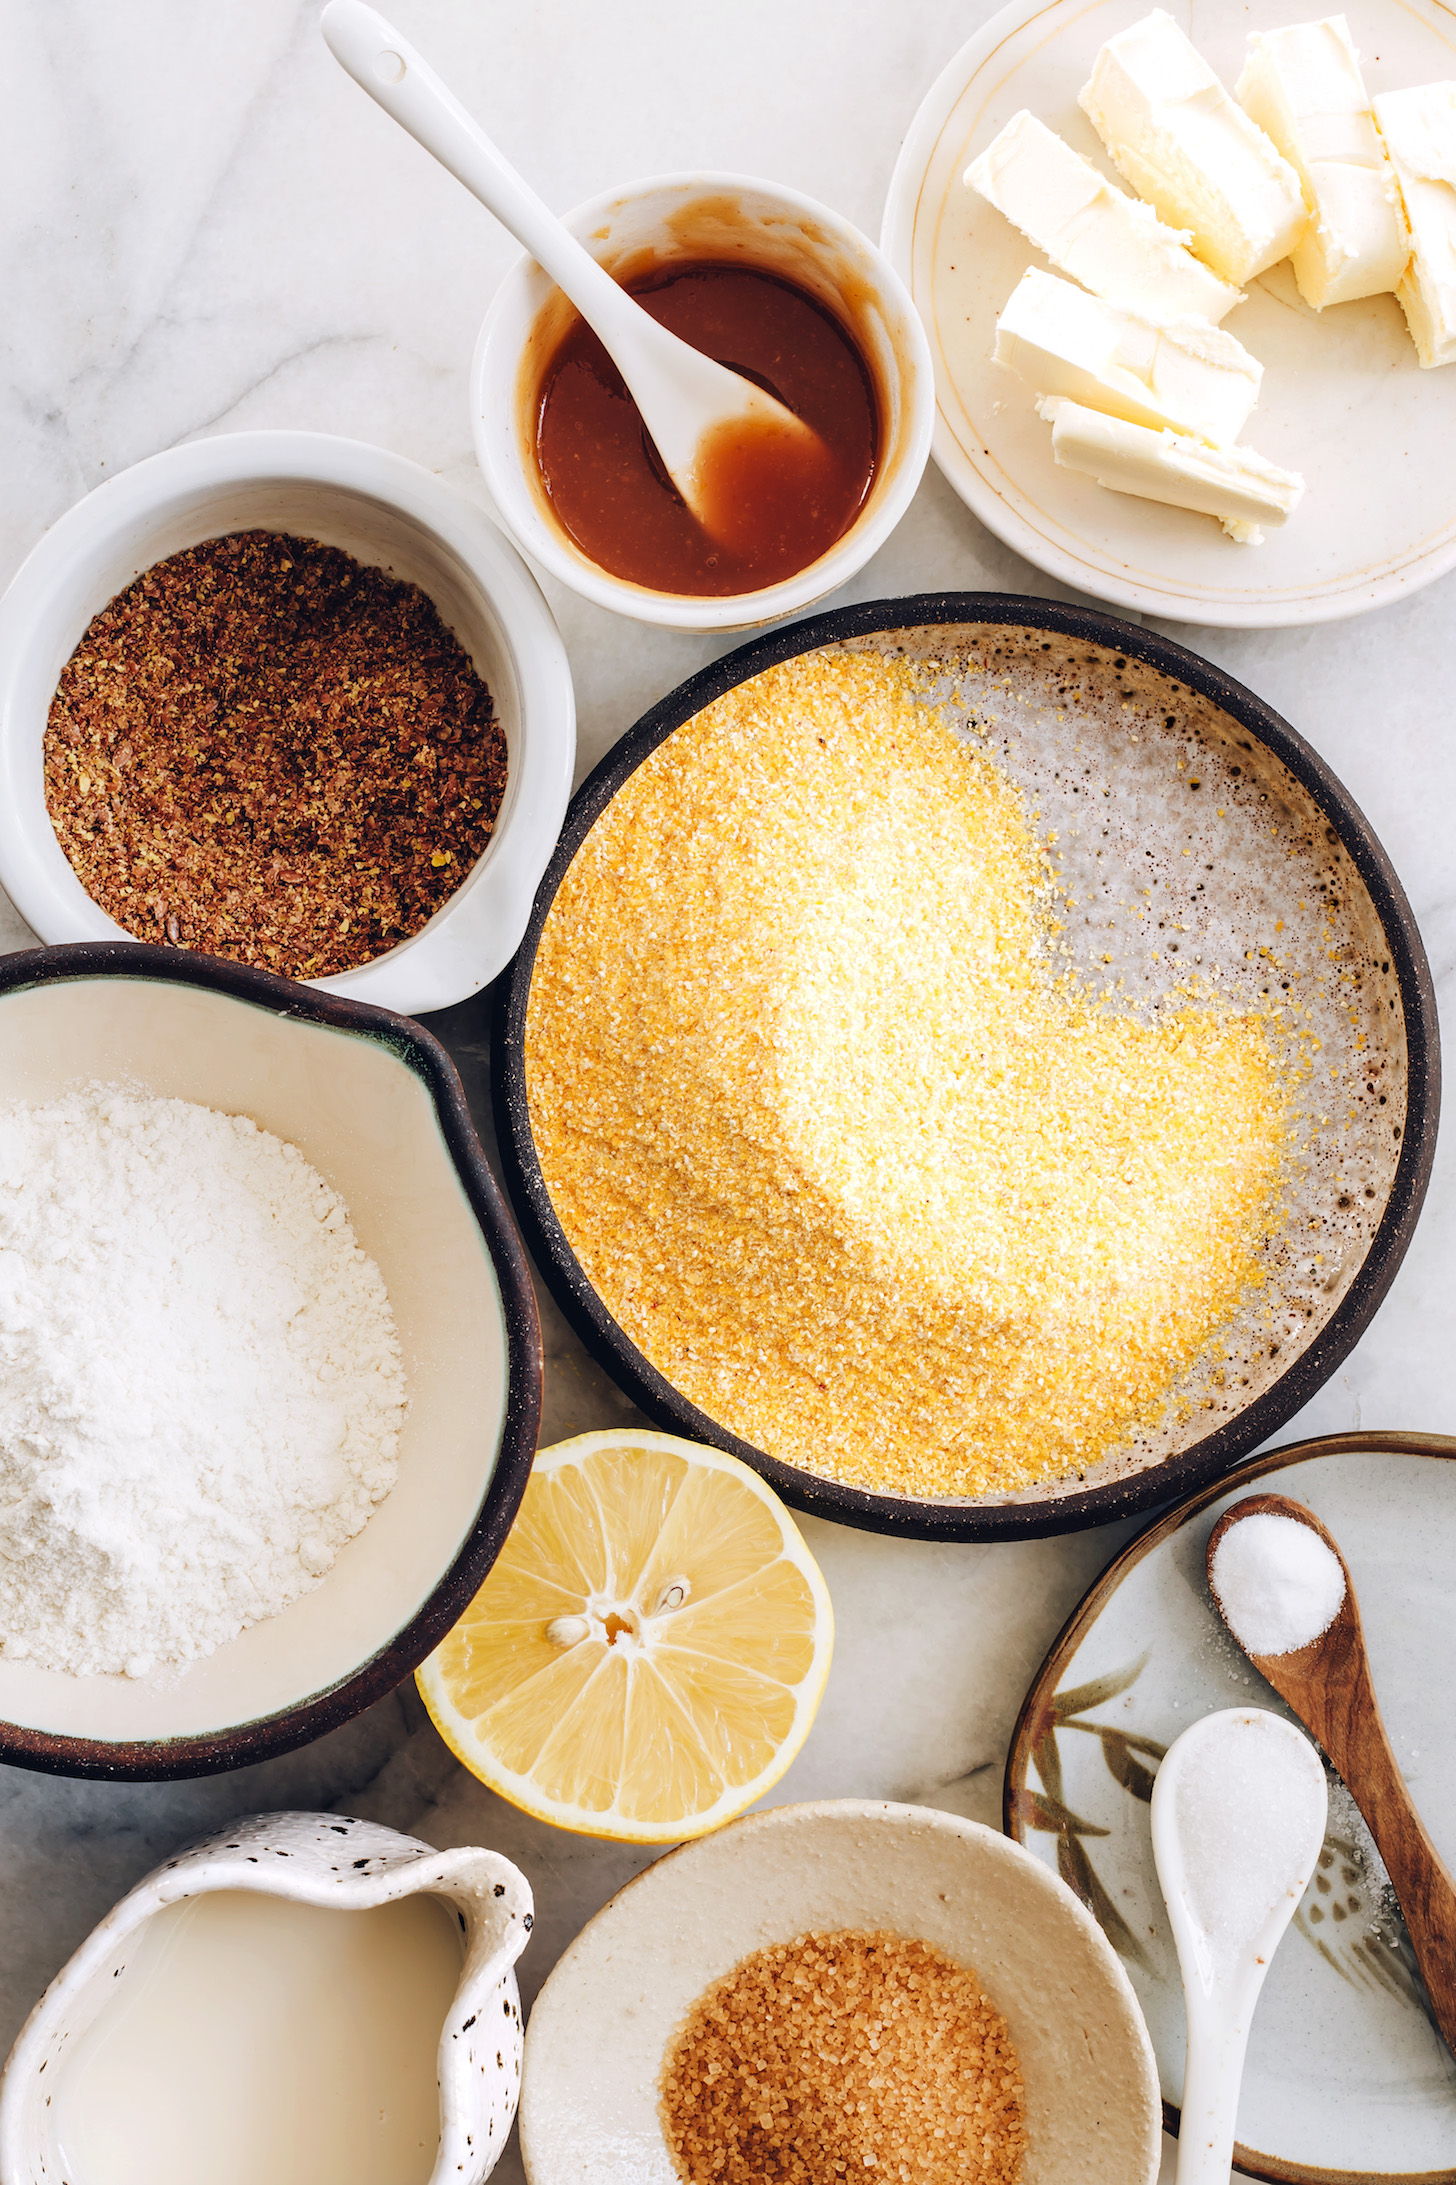 Harina de maíz, harina, linaza molida, limón, leche de almendras, mantequilla vegana, puré de manzana, sal, bicarbonato de sodio y azúcar